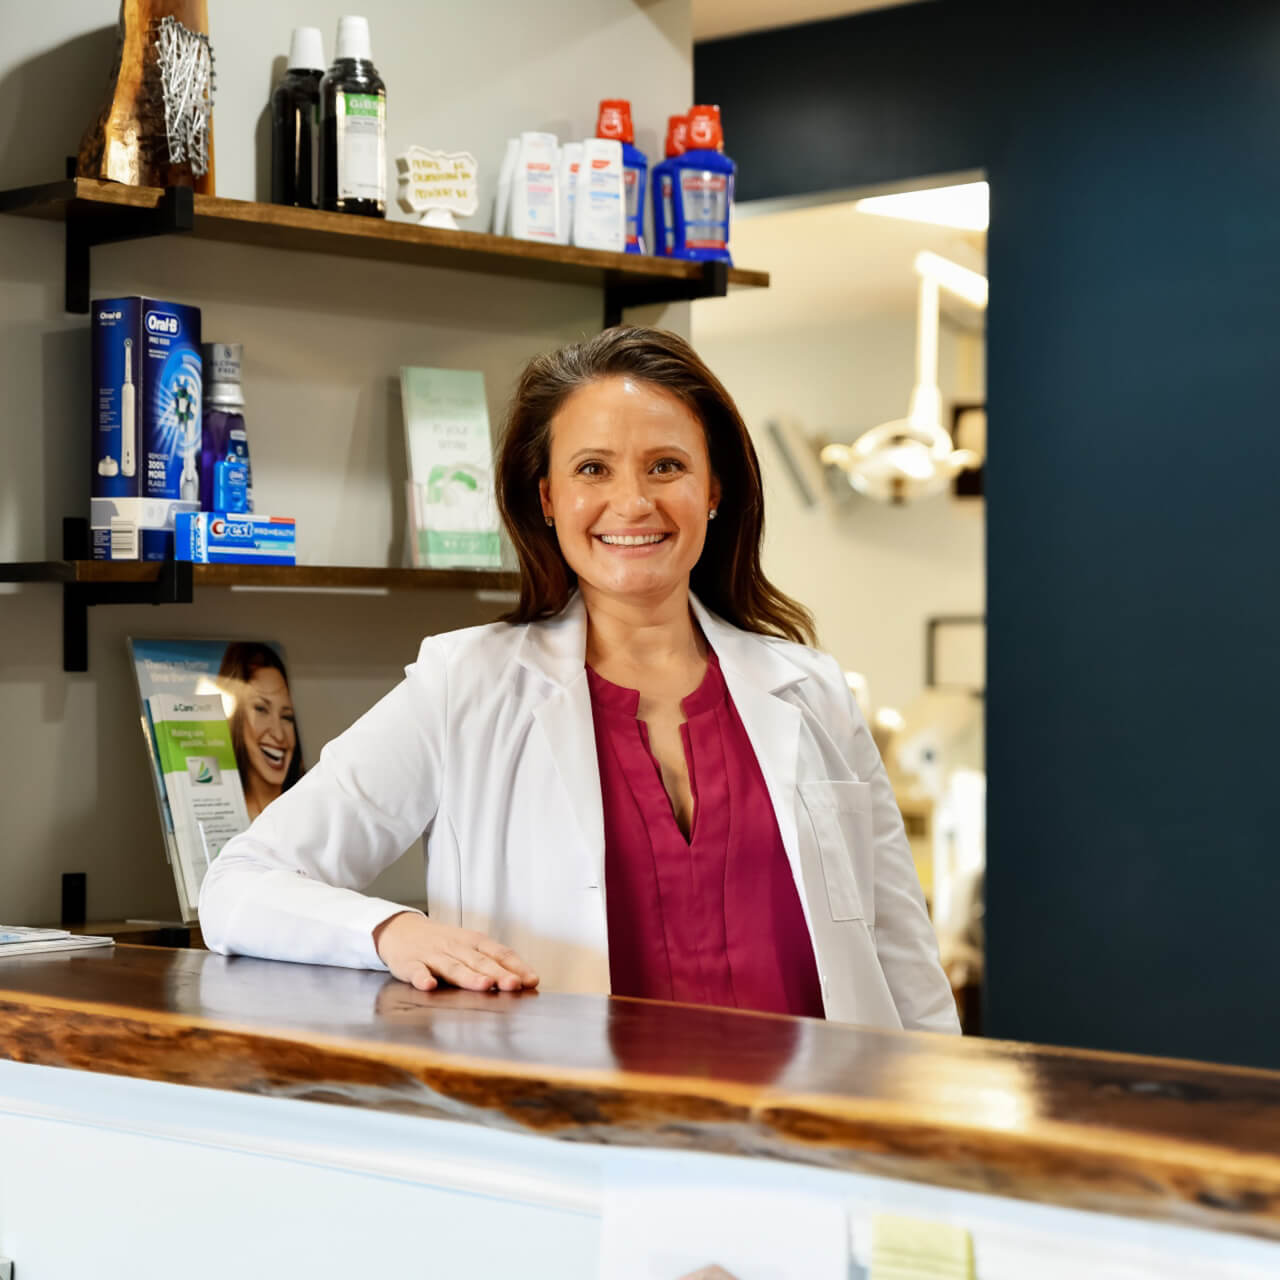 Dr. Megan Kottman provides great dental care to patients.